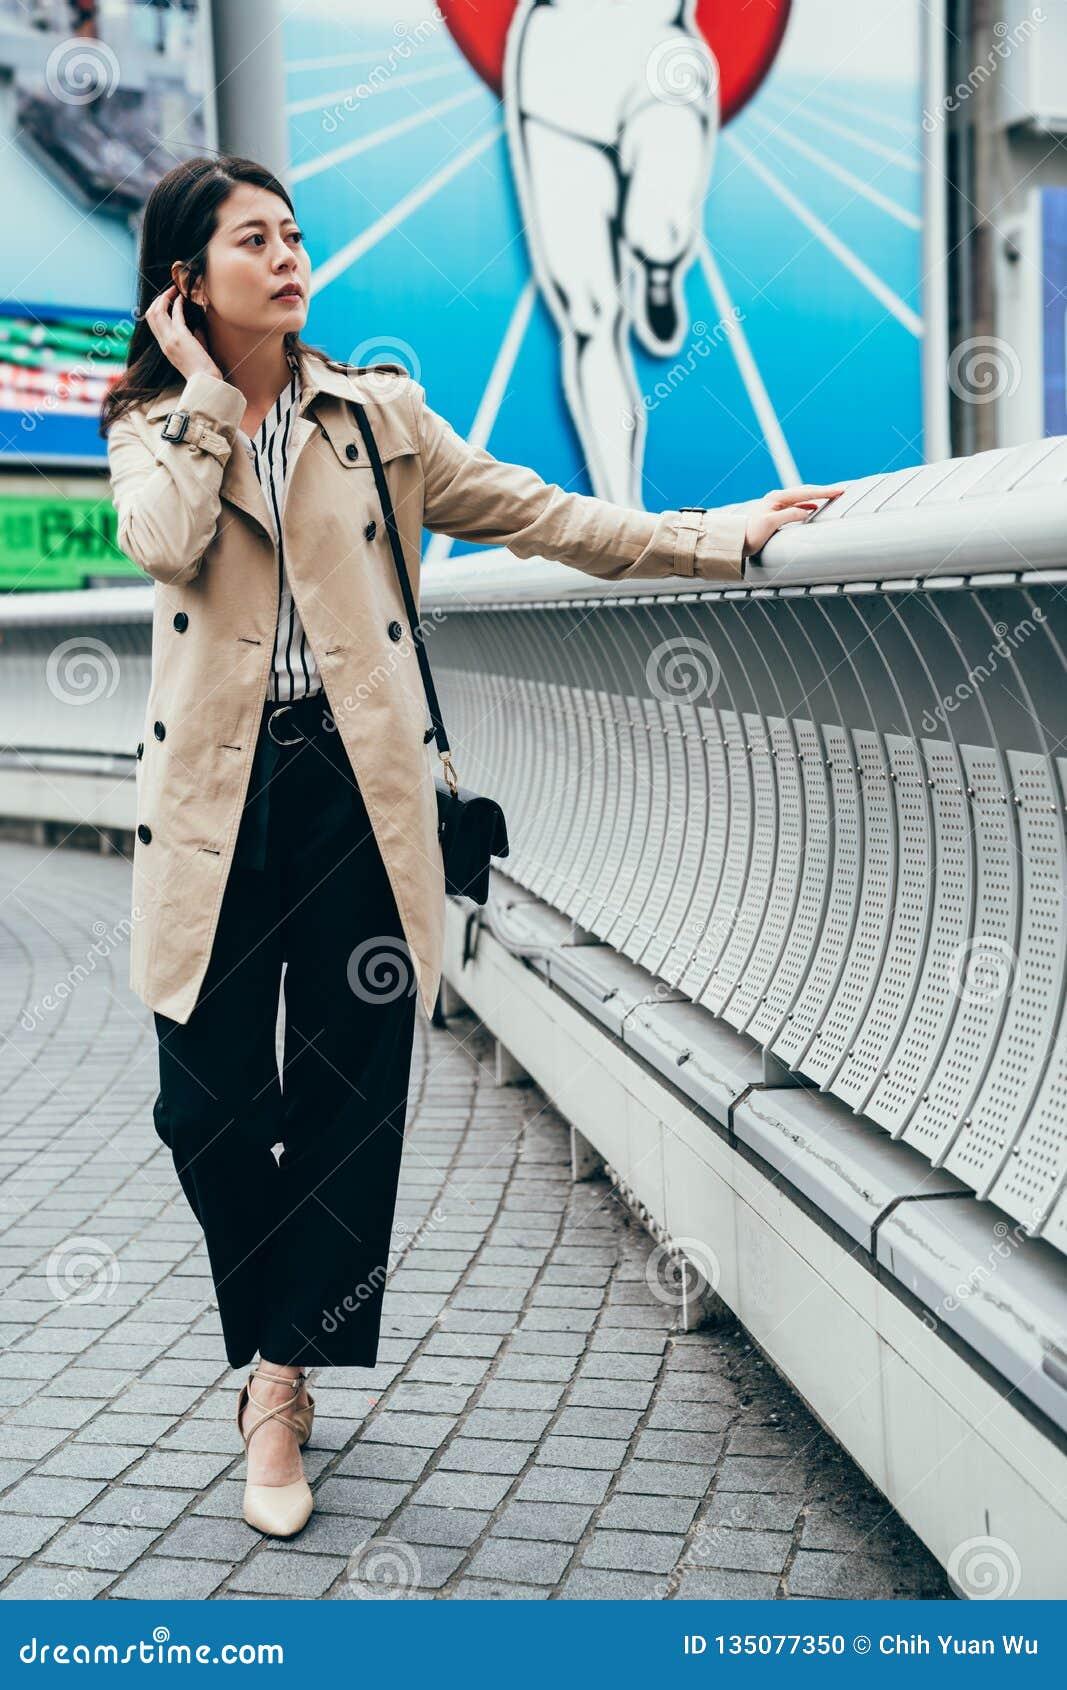 Stadtlebensstil der jungen Frau der Mode st?dtischer lebender